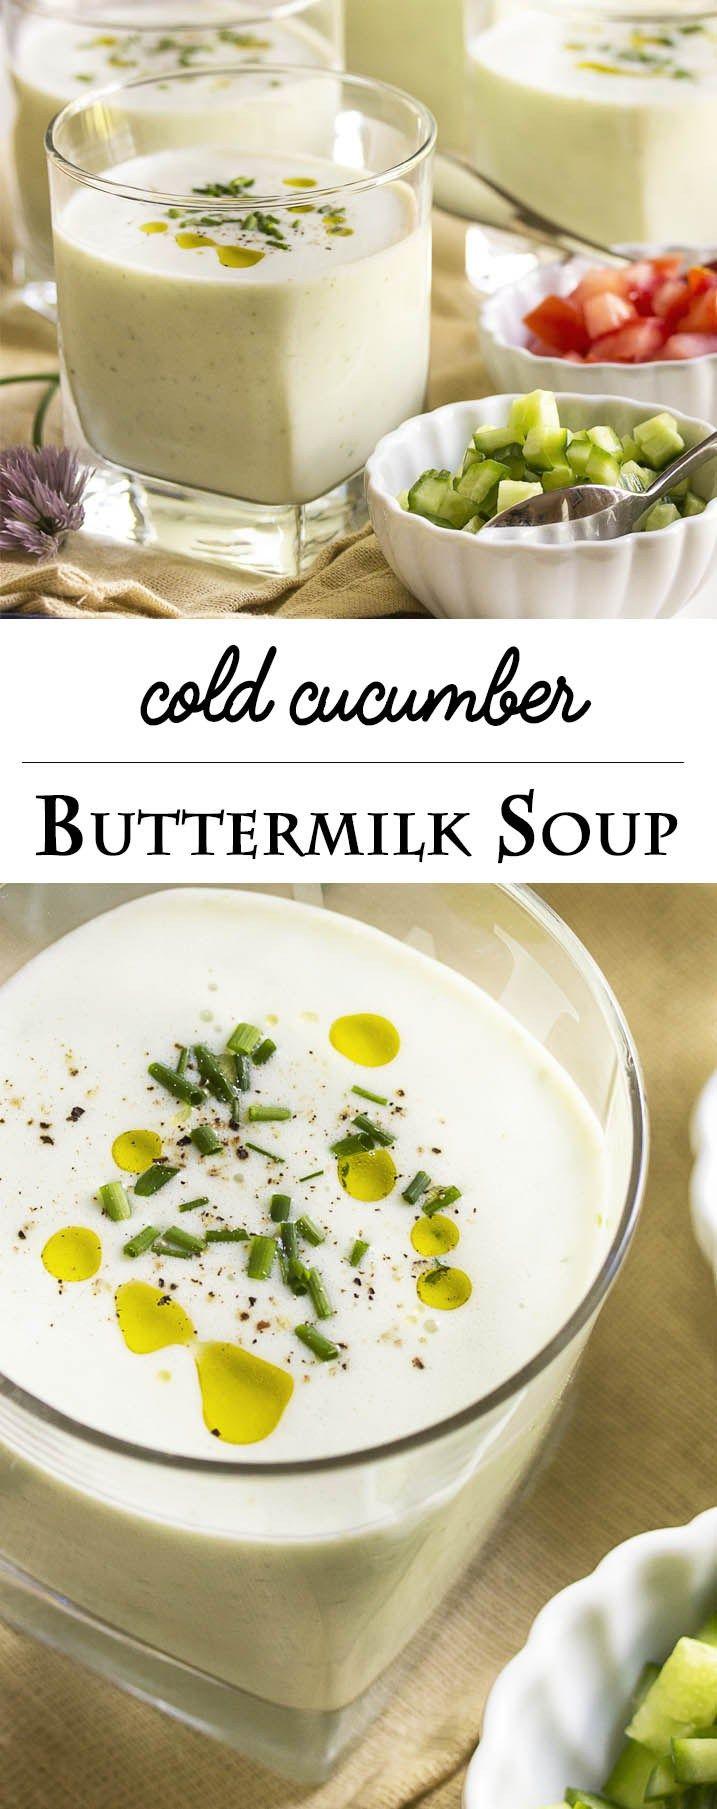 17 Best ideas about Cucumber Soup Recipe on Pinterest ...